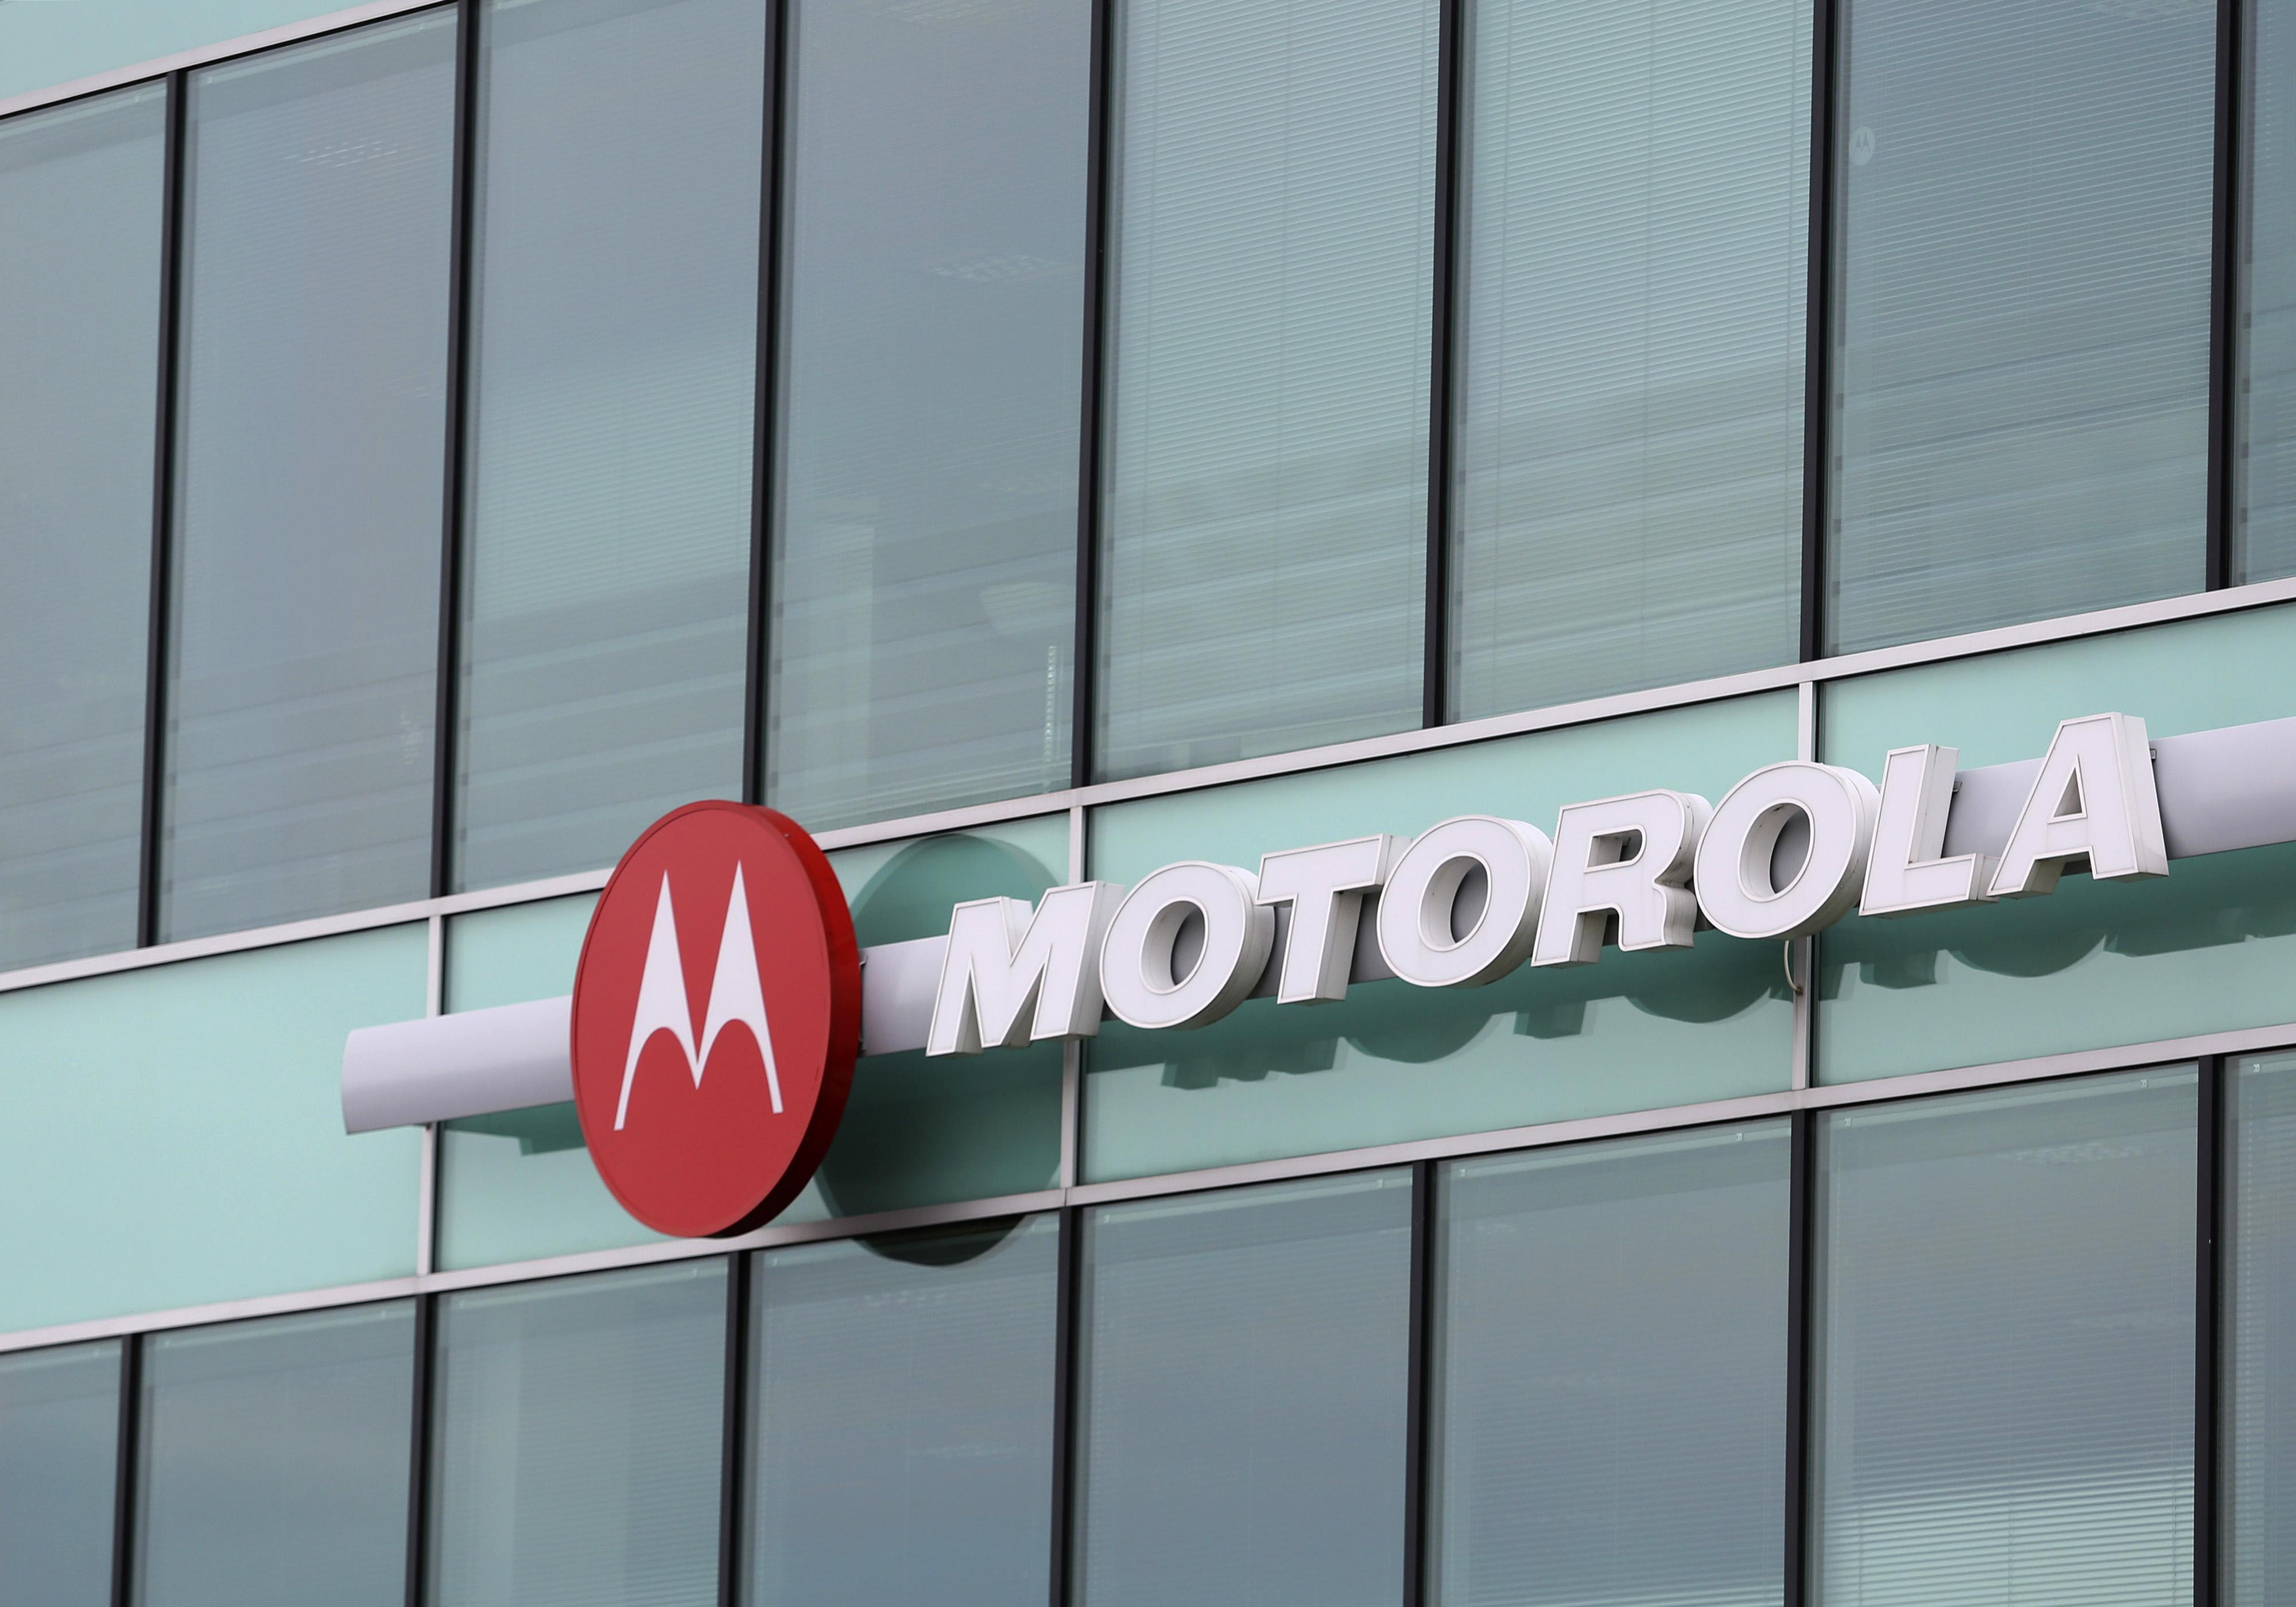 A Motorola logo.